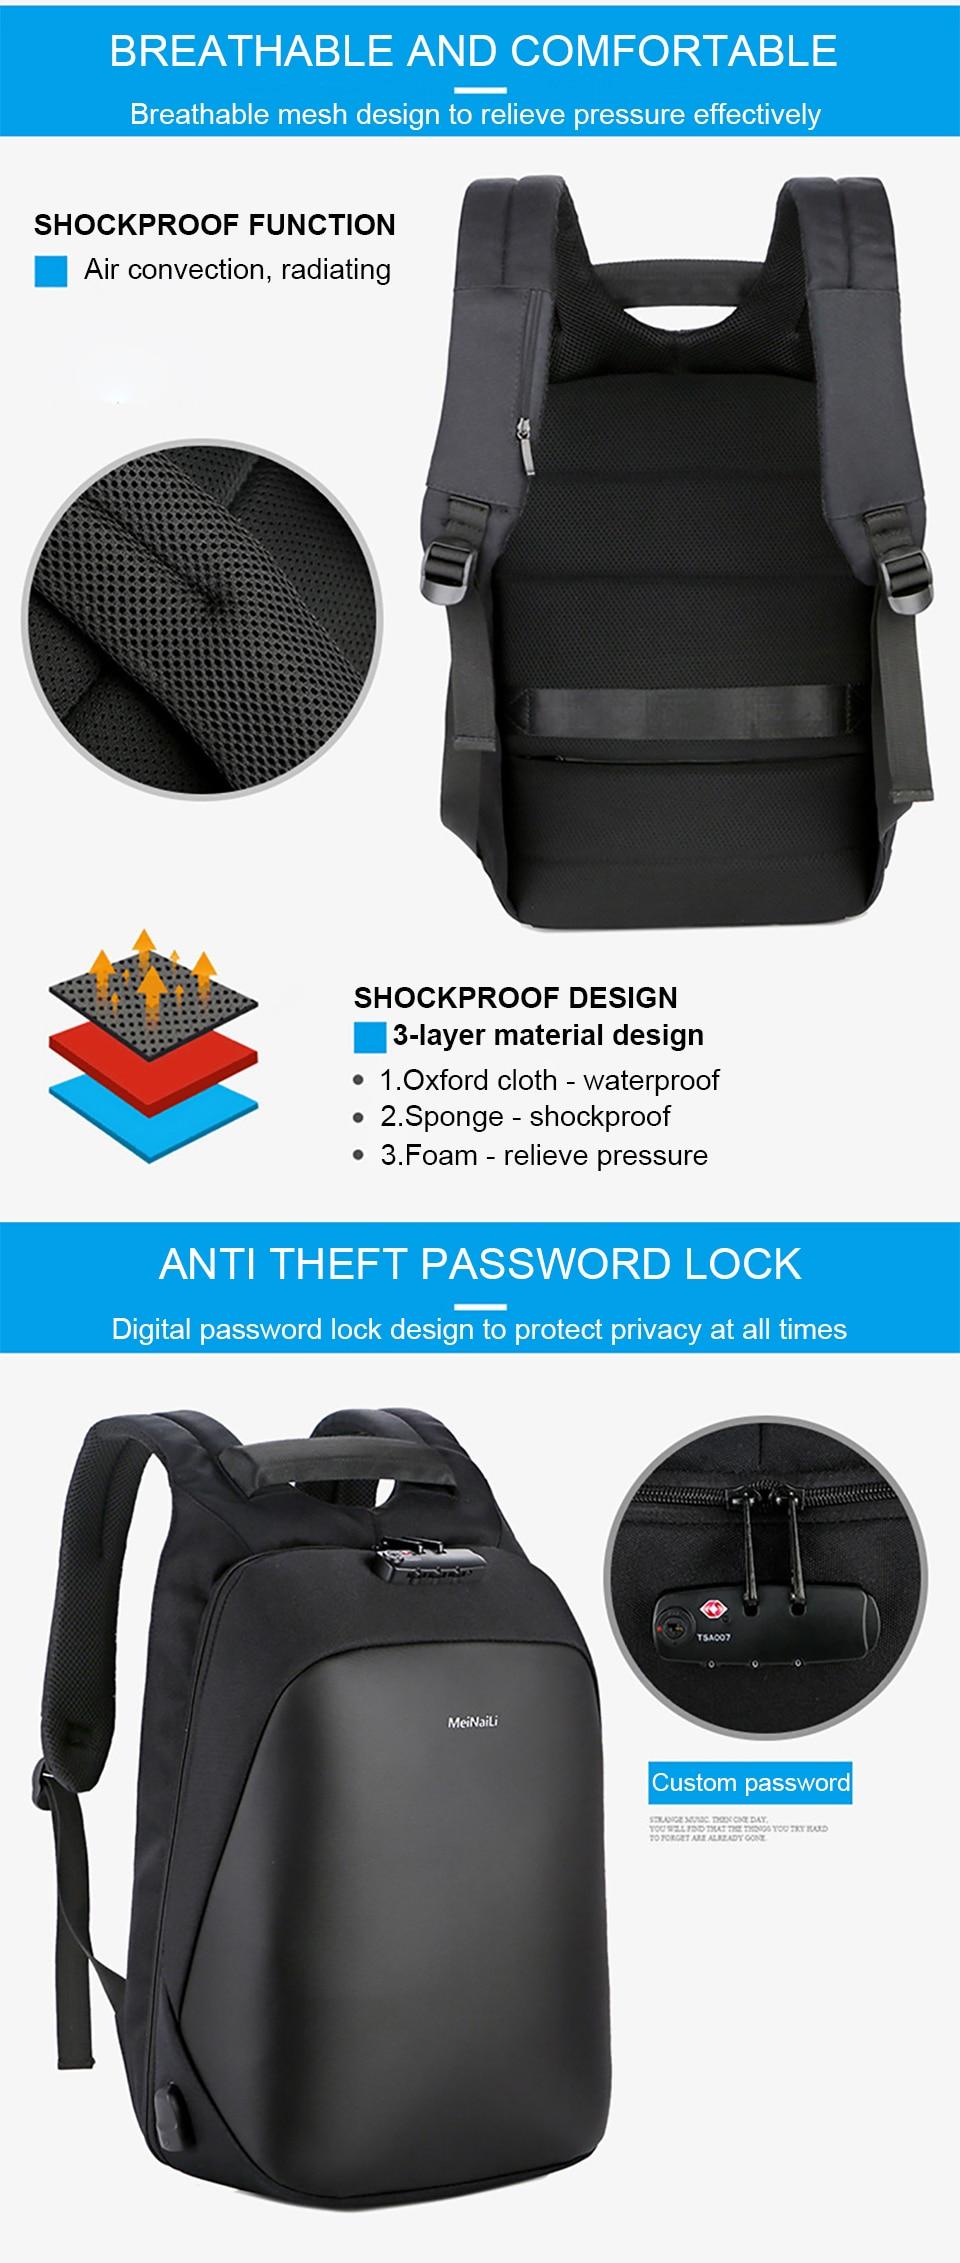 4 Anti-theft Backpack Men Backpacks Laptop 15.6'' Business Travel Luggage Bag Pack Waterproof USB Password Lock Male Backpacking